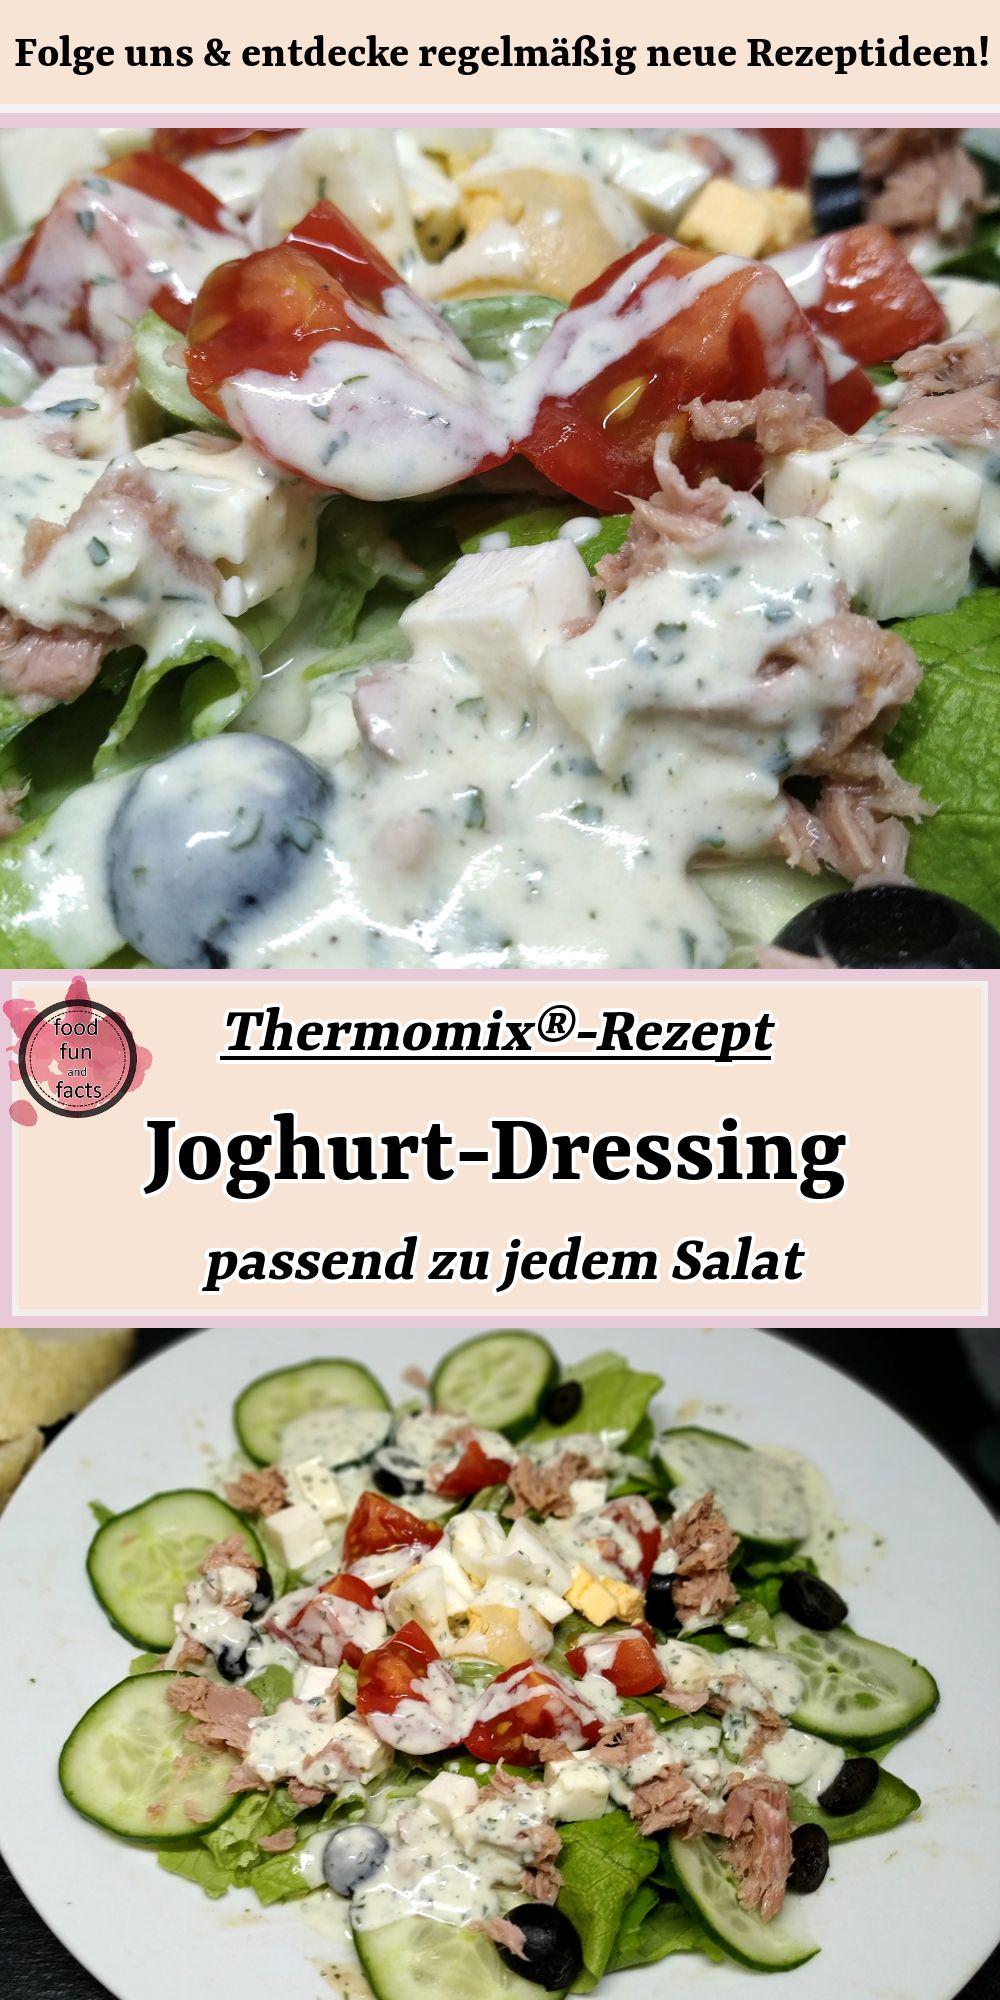 Joghurt-Dressing | Thermomix®-Rezept